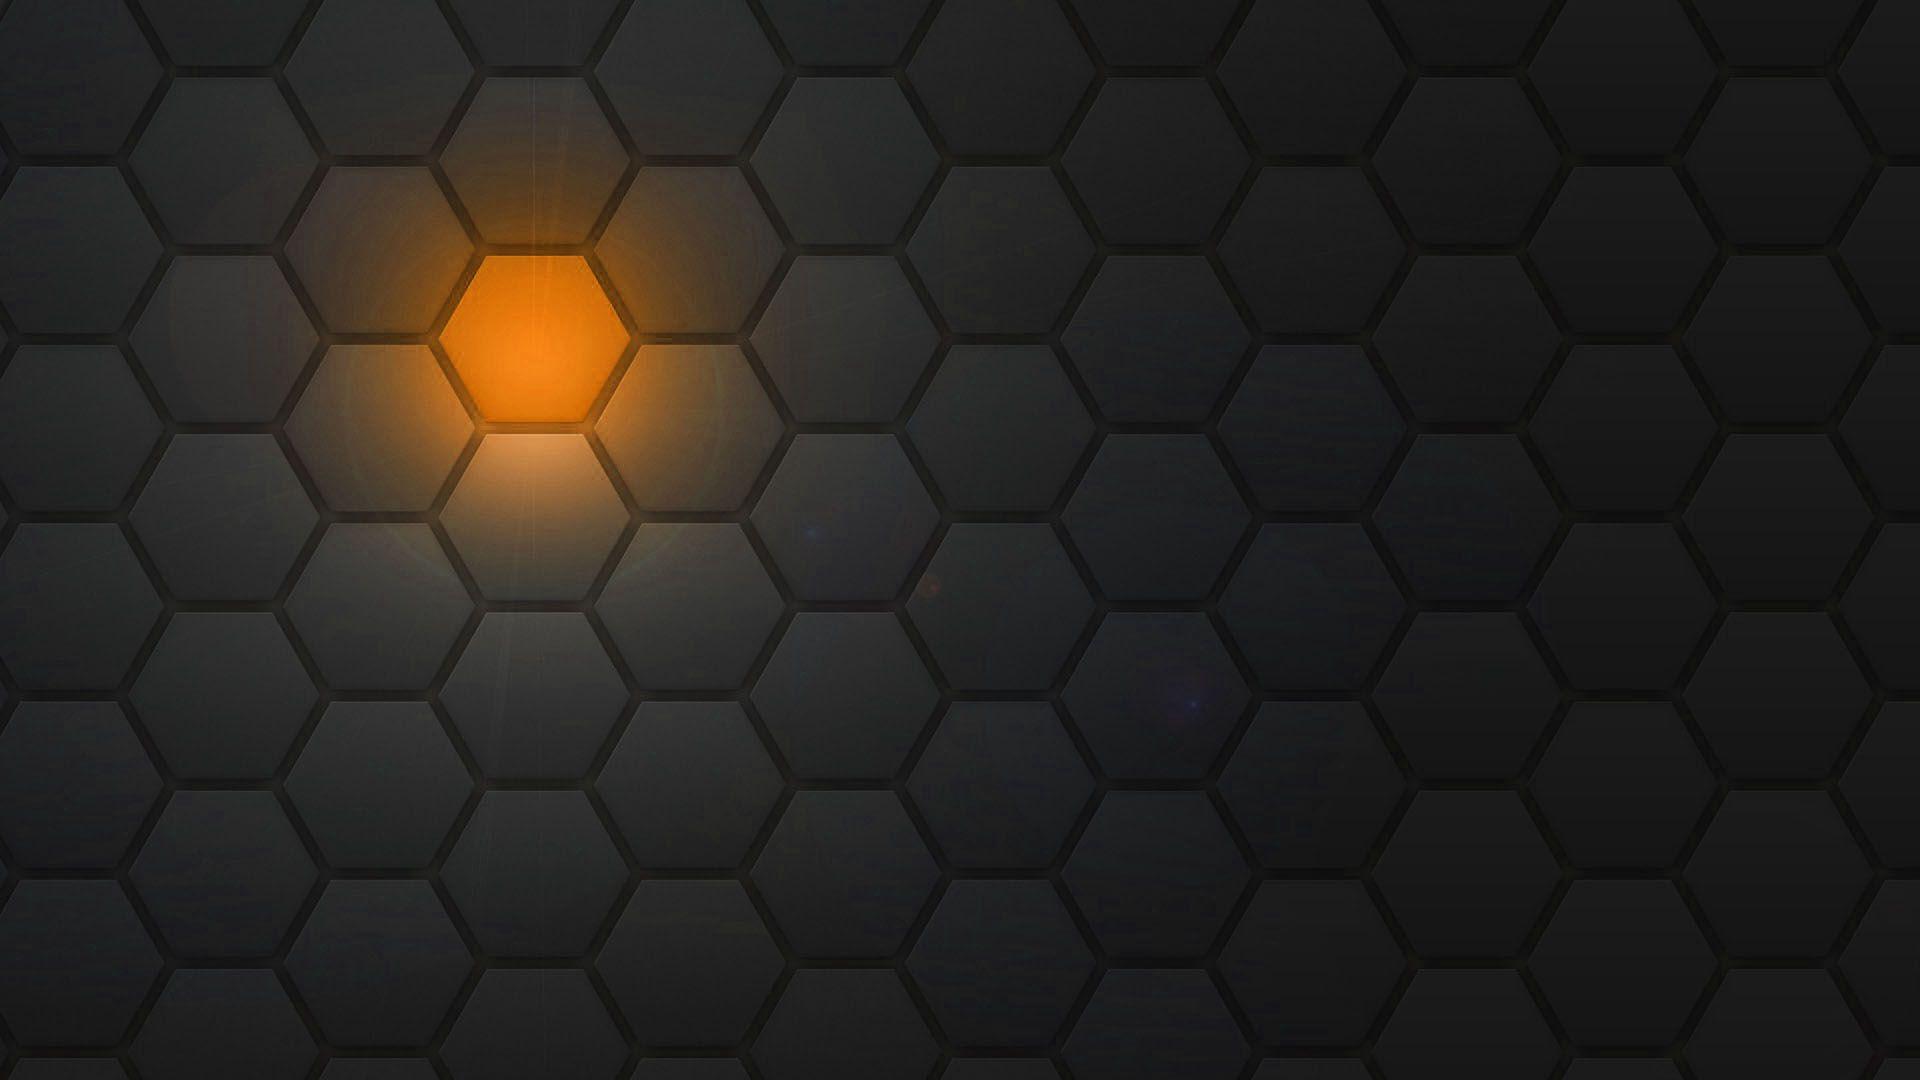 Orange Wallpaper Samsung Galaxy Wallpaper Pattern Wallpaper